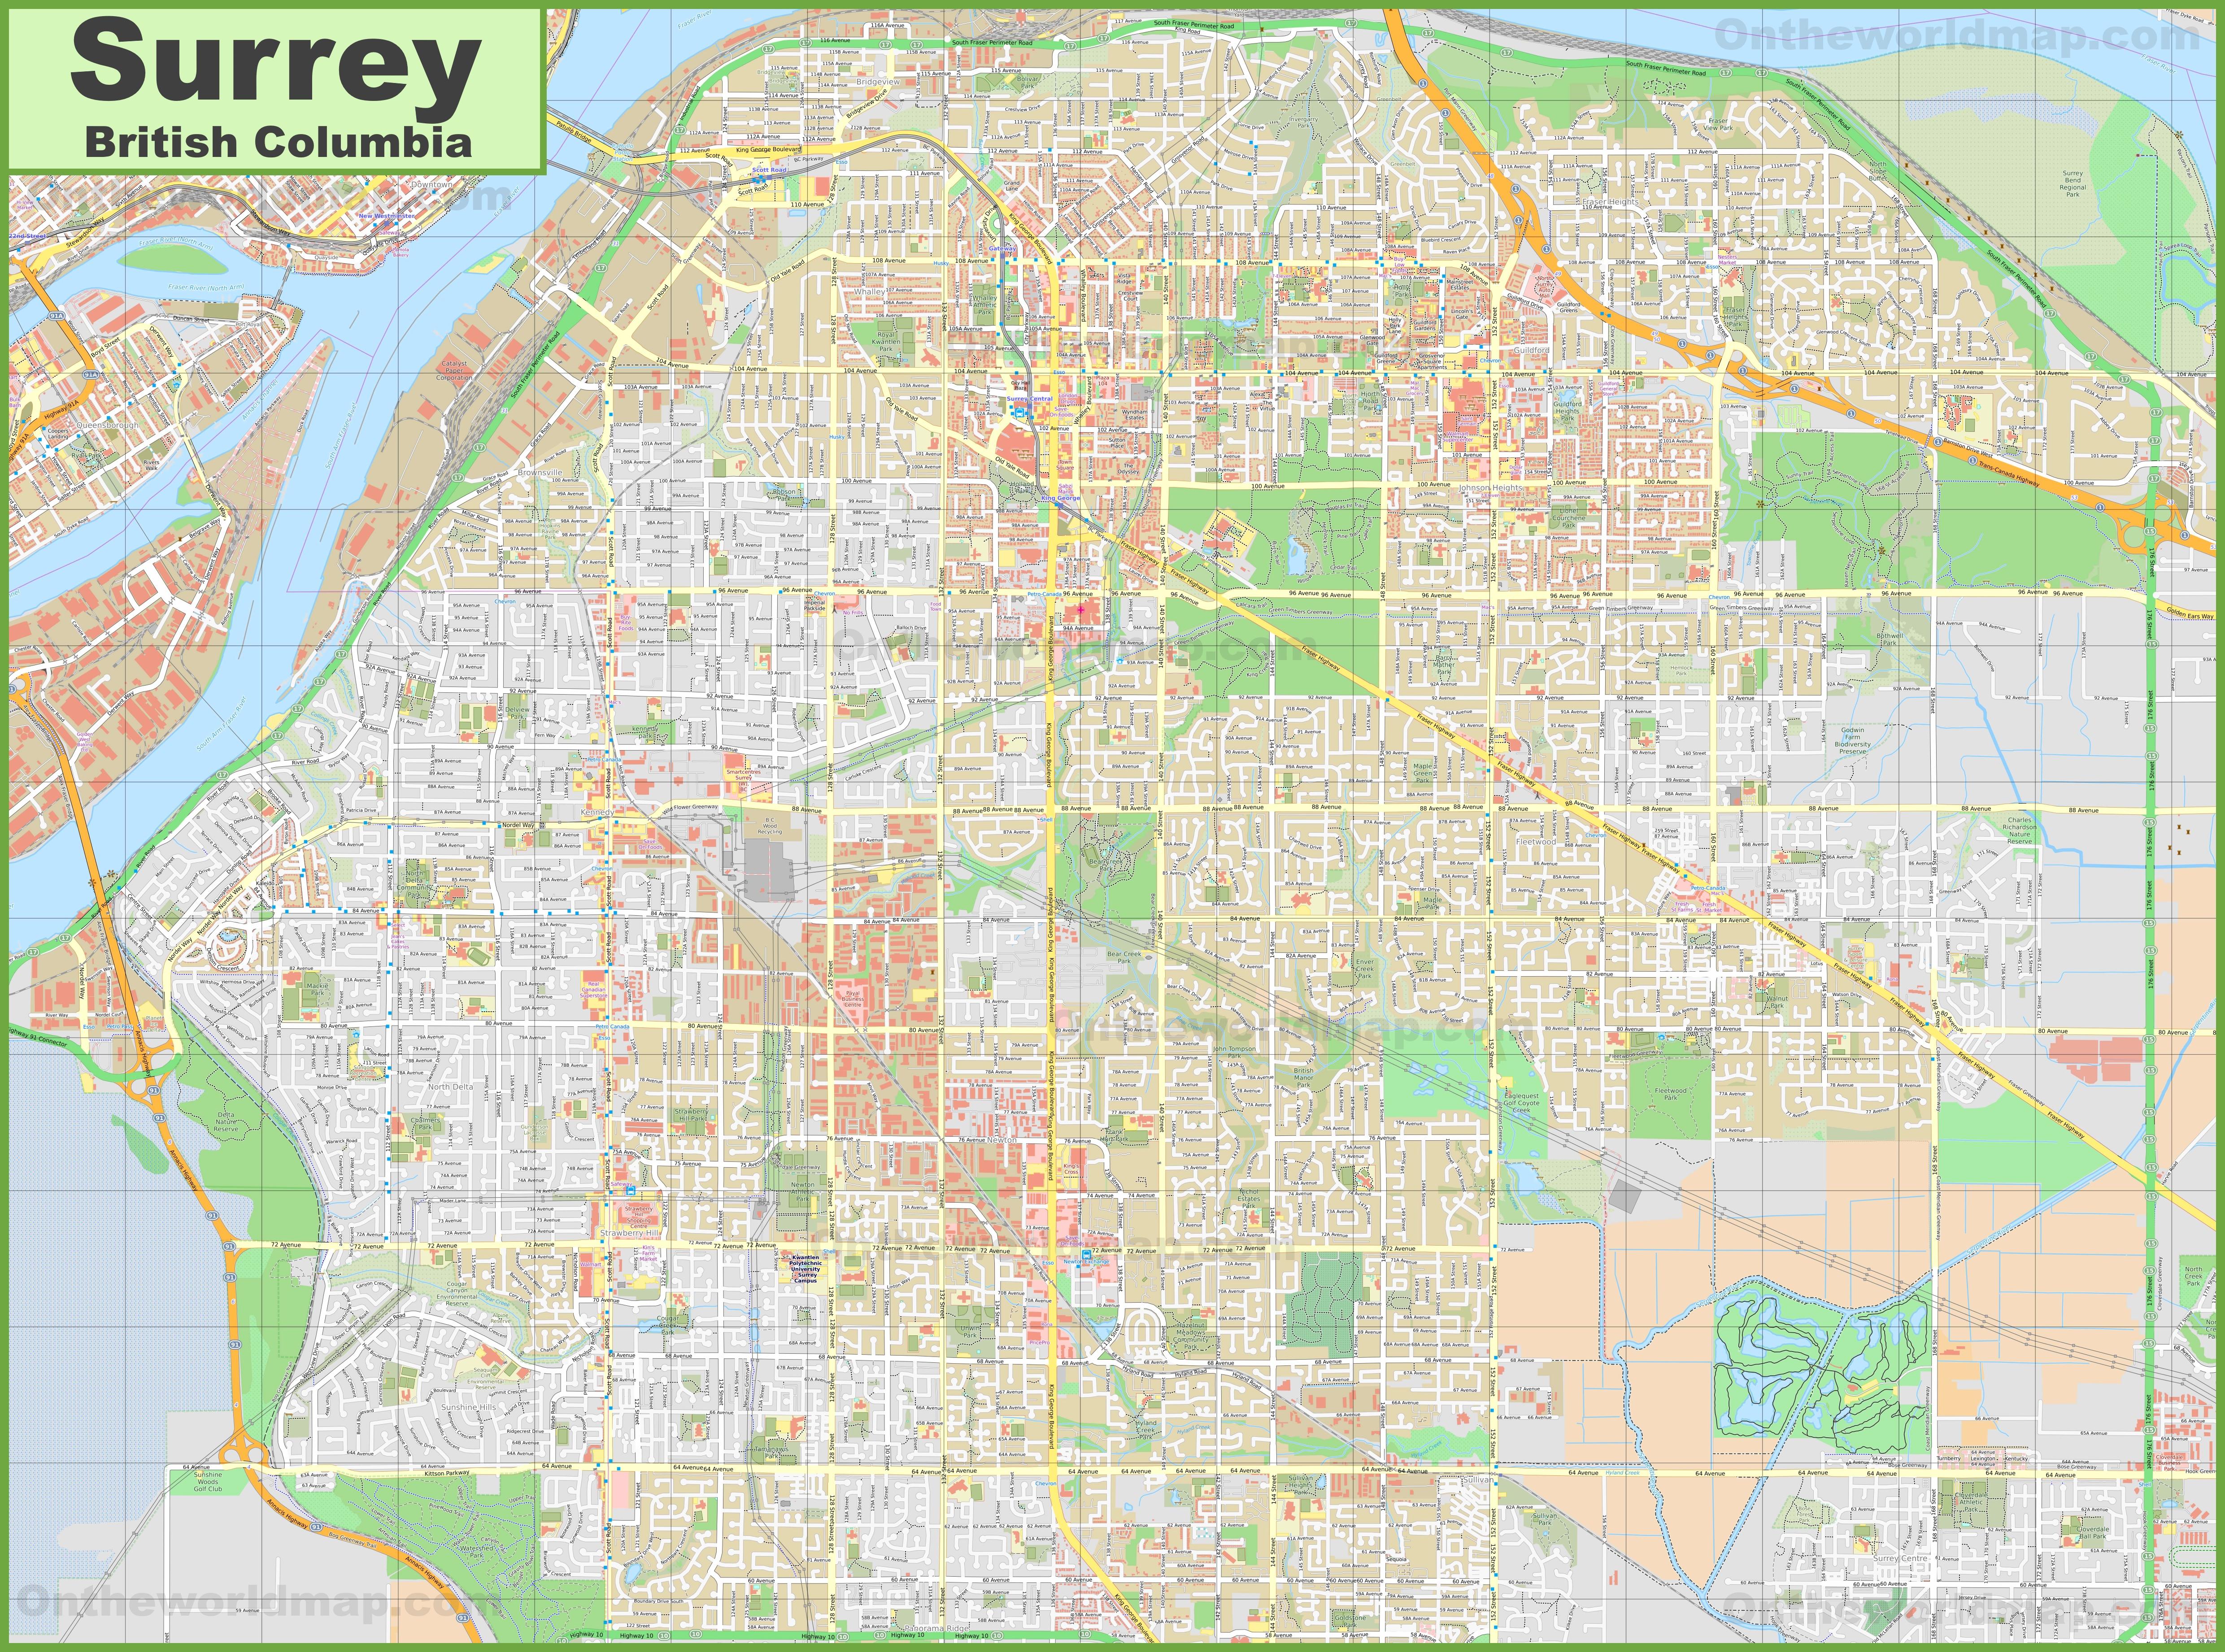 Large detailed map of Surrey on alaska map, alberta map, calgary map, london map, or map, manitoba map, india map, surrey map, british columbia map, brazil map, costa rica map, nova scotia map, maryland map, ks map, united kingdom map, hungary map, madagascar map, de map, ontario map, vancouver map,